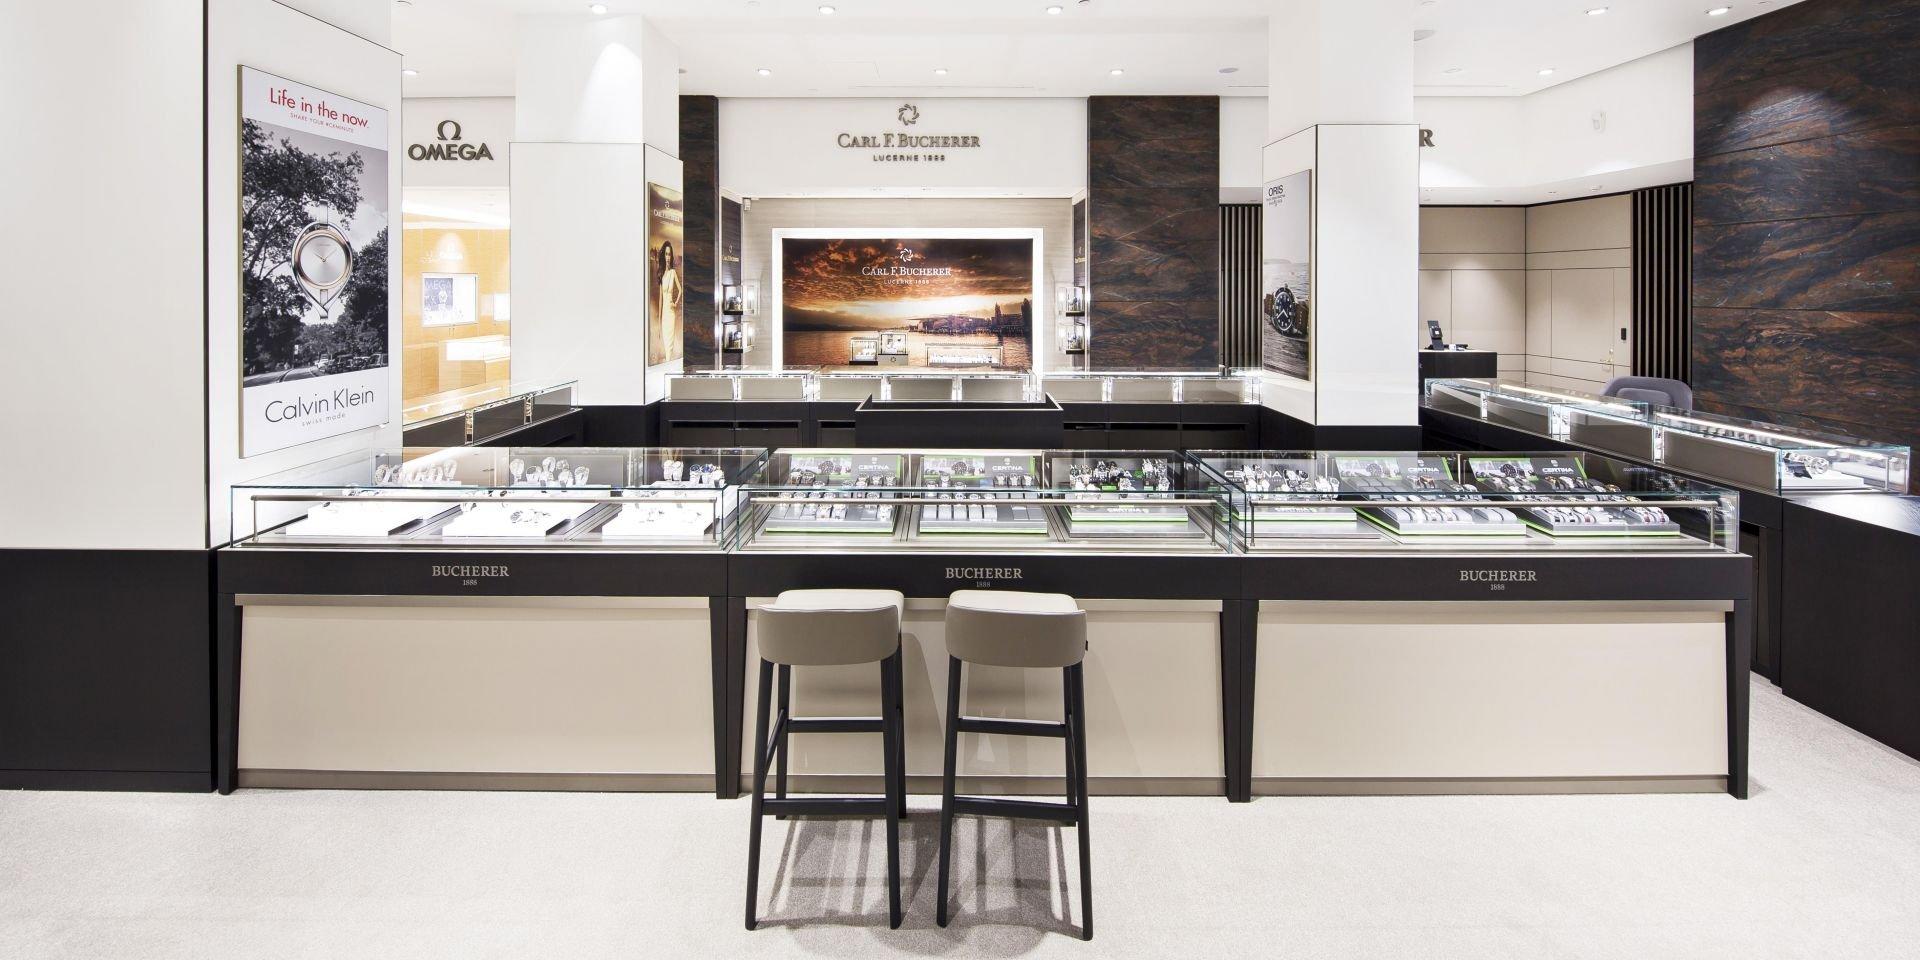 d3da4df8ca9 Bucherer Denmark. High-end watches and jewellery on 650sqm in the  prestigious shopping mall Illum ...